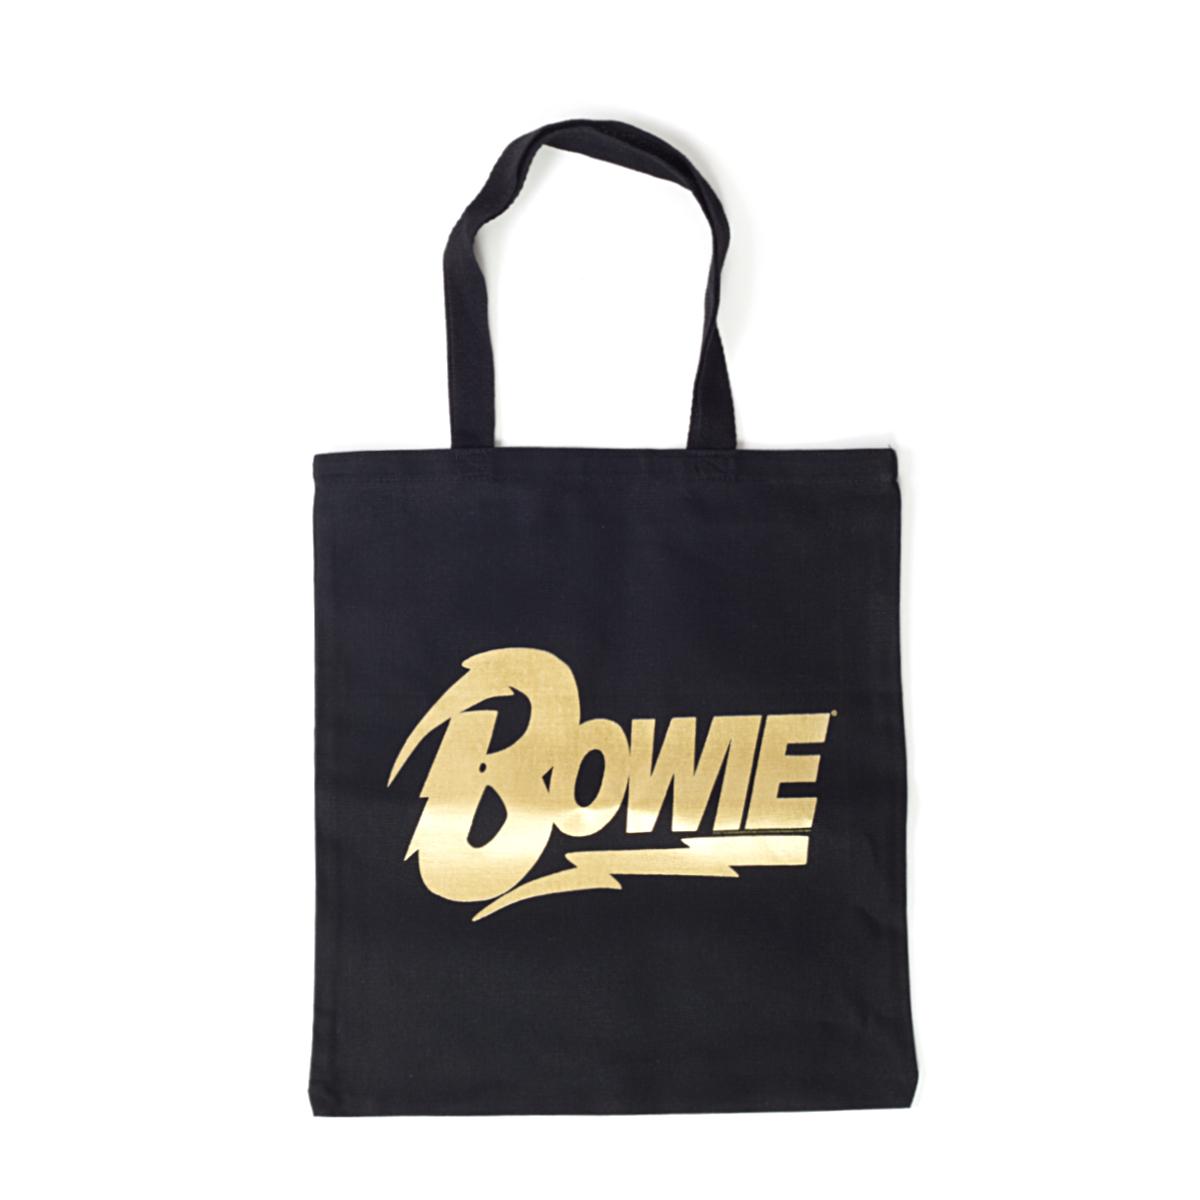 David Bowie Gold Bowie Text Black Tote Bag